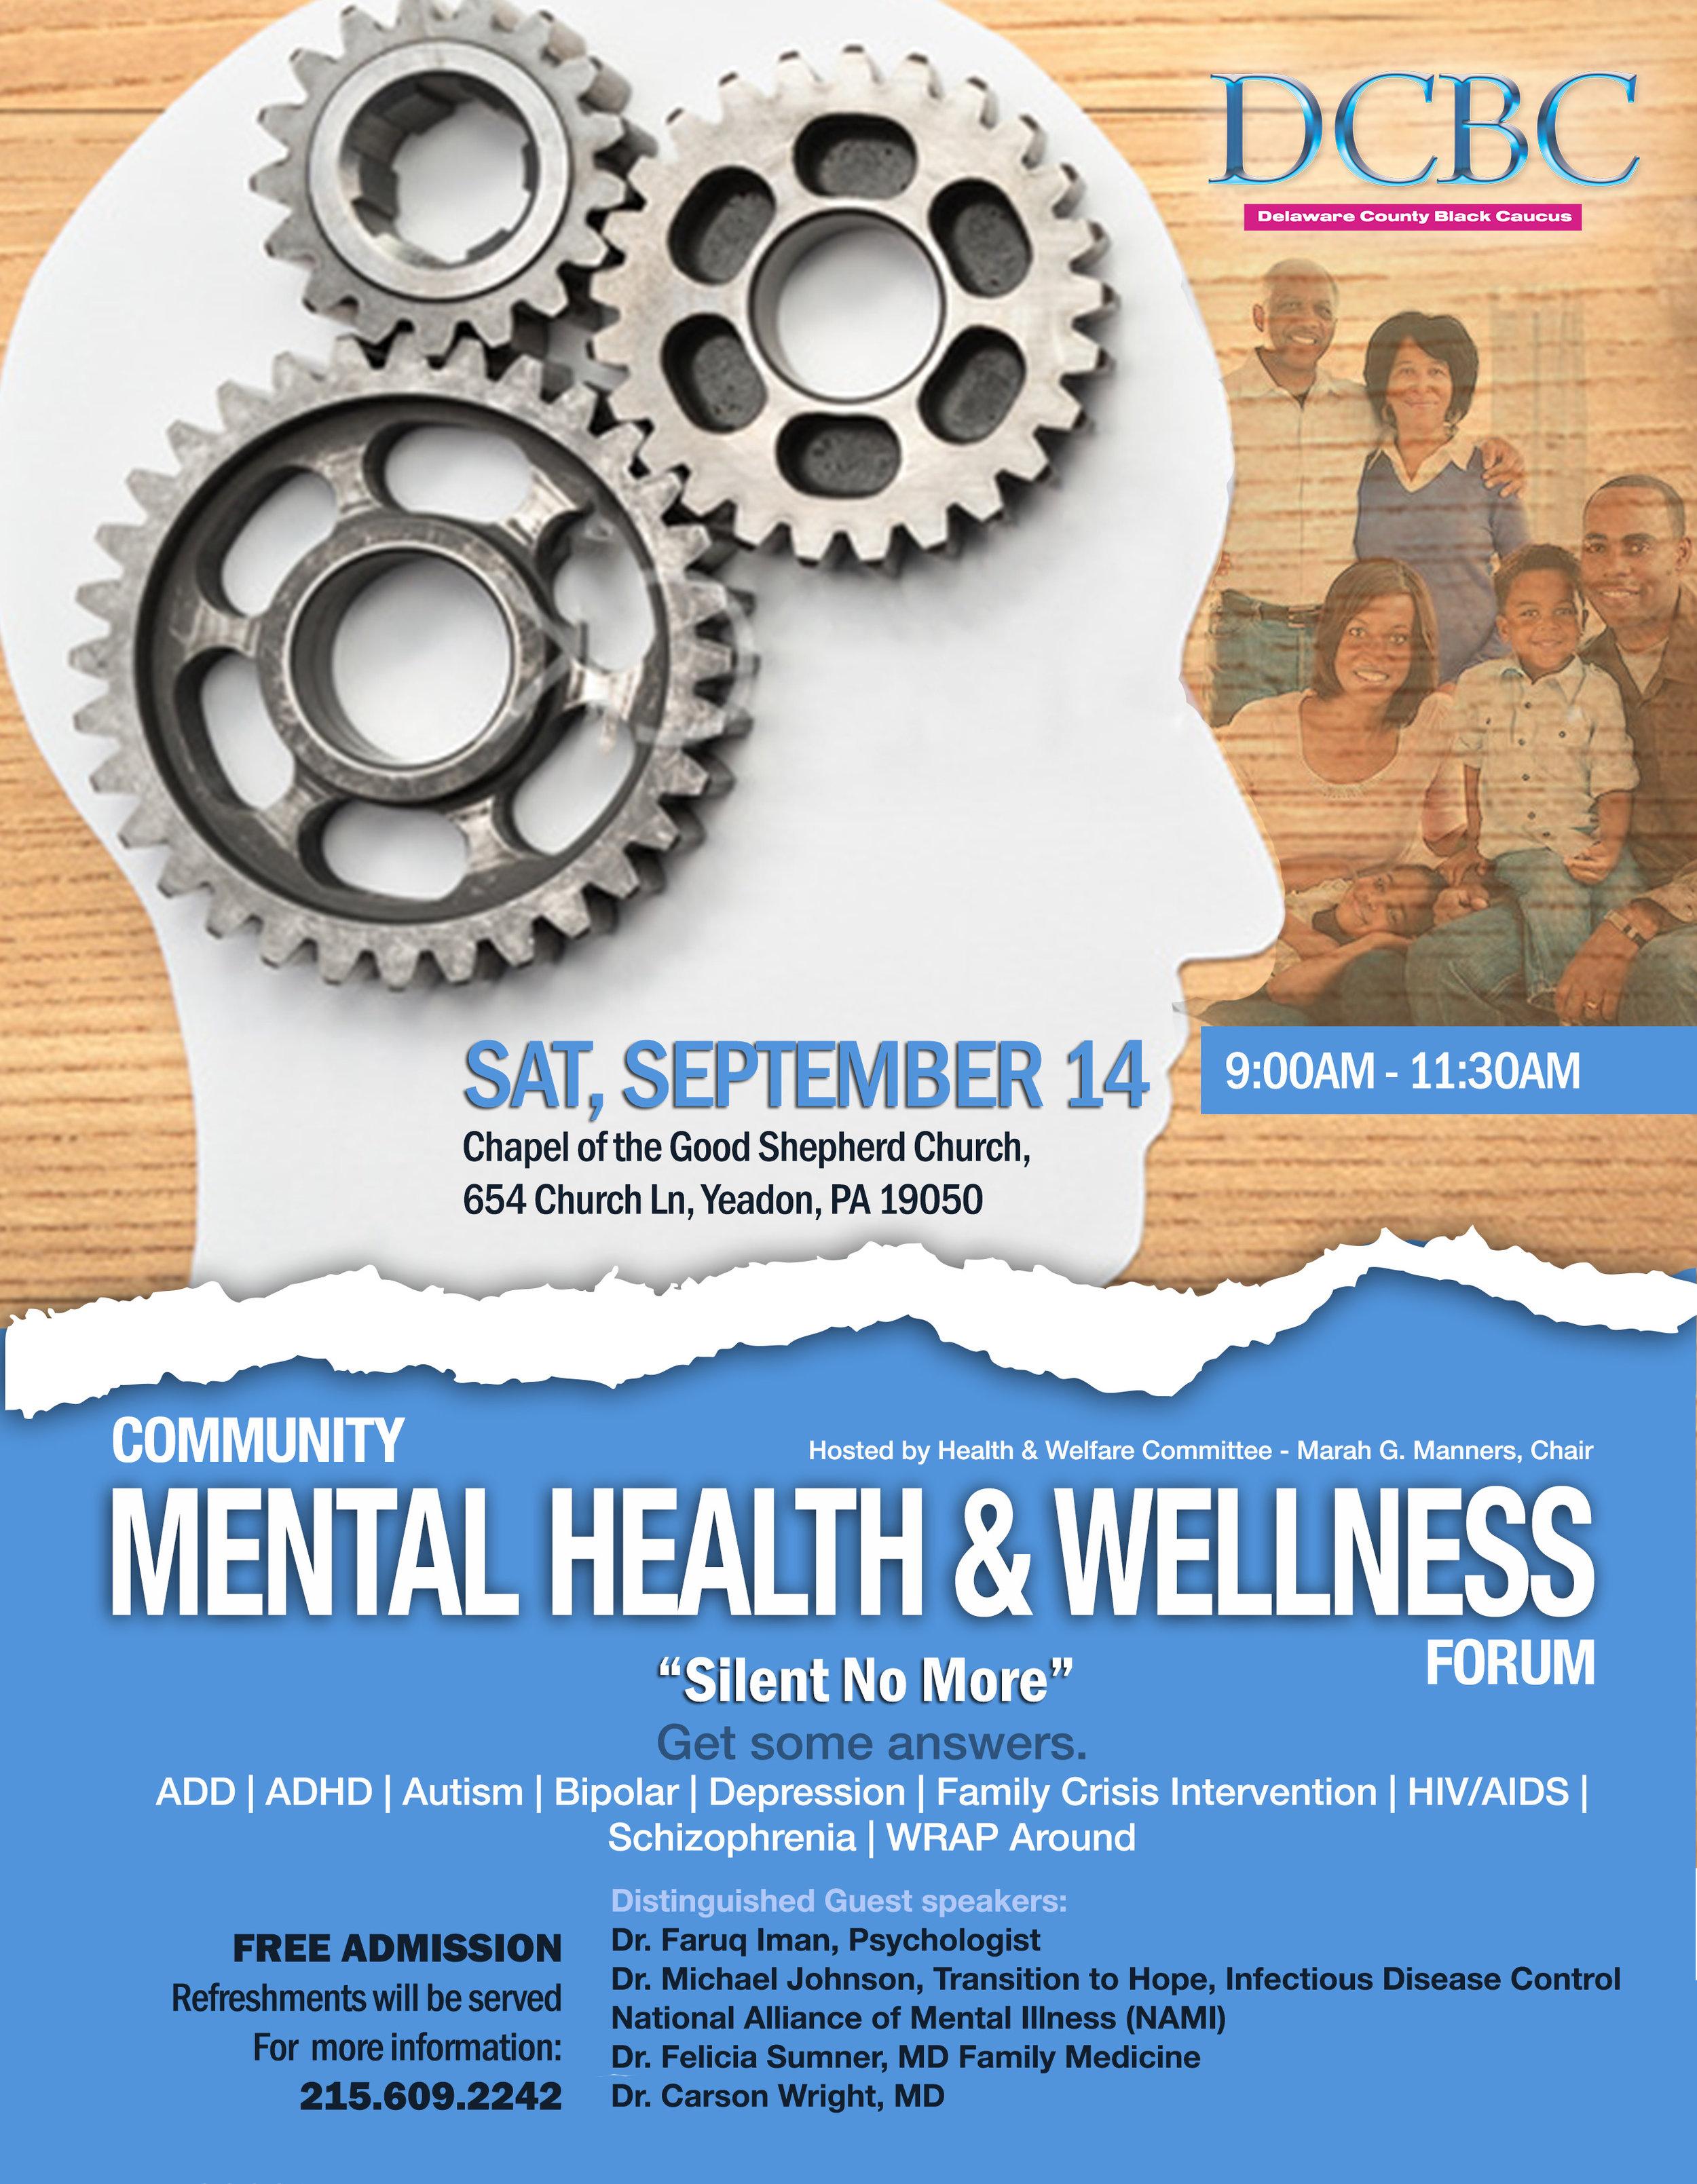 DCBC Mental Health & Wellness Flier.jpg